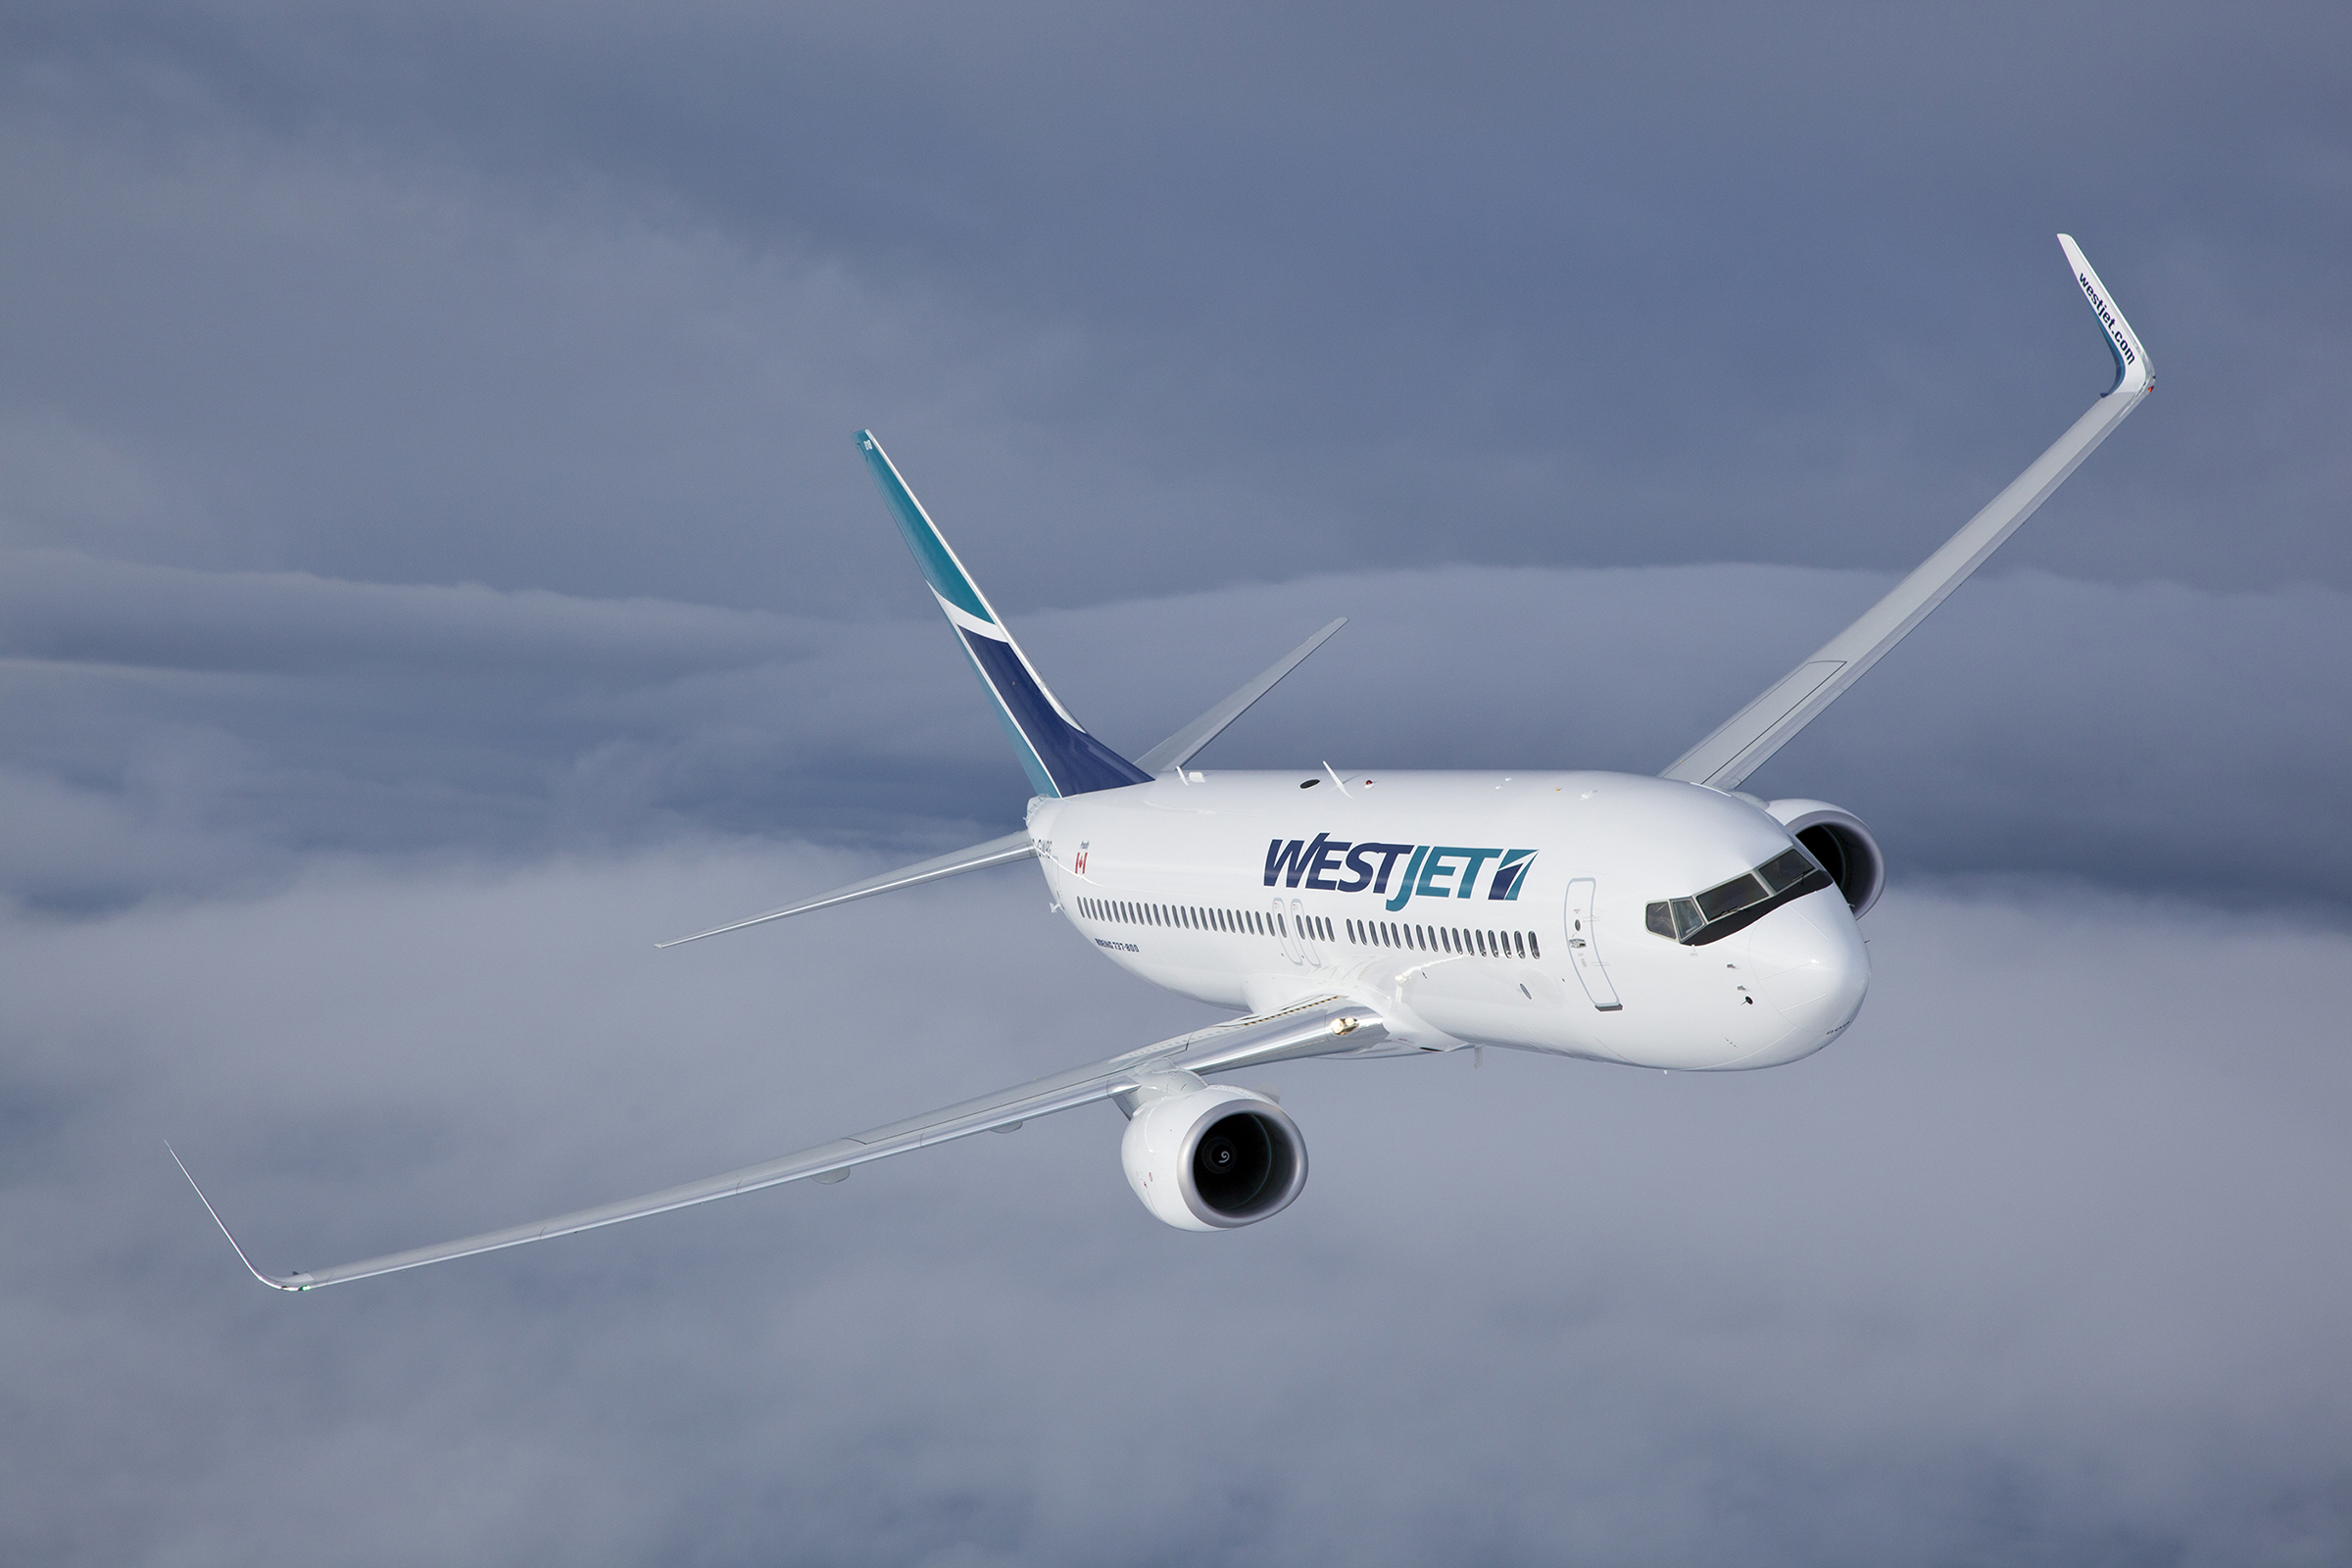 WestJet, Air France, and KLM release details of reciprocal frequent flyer redemption